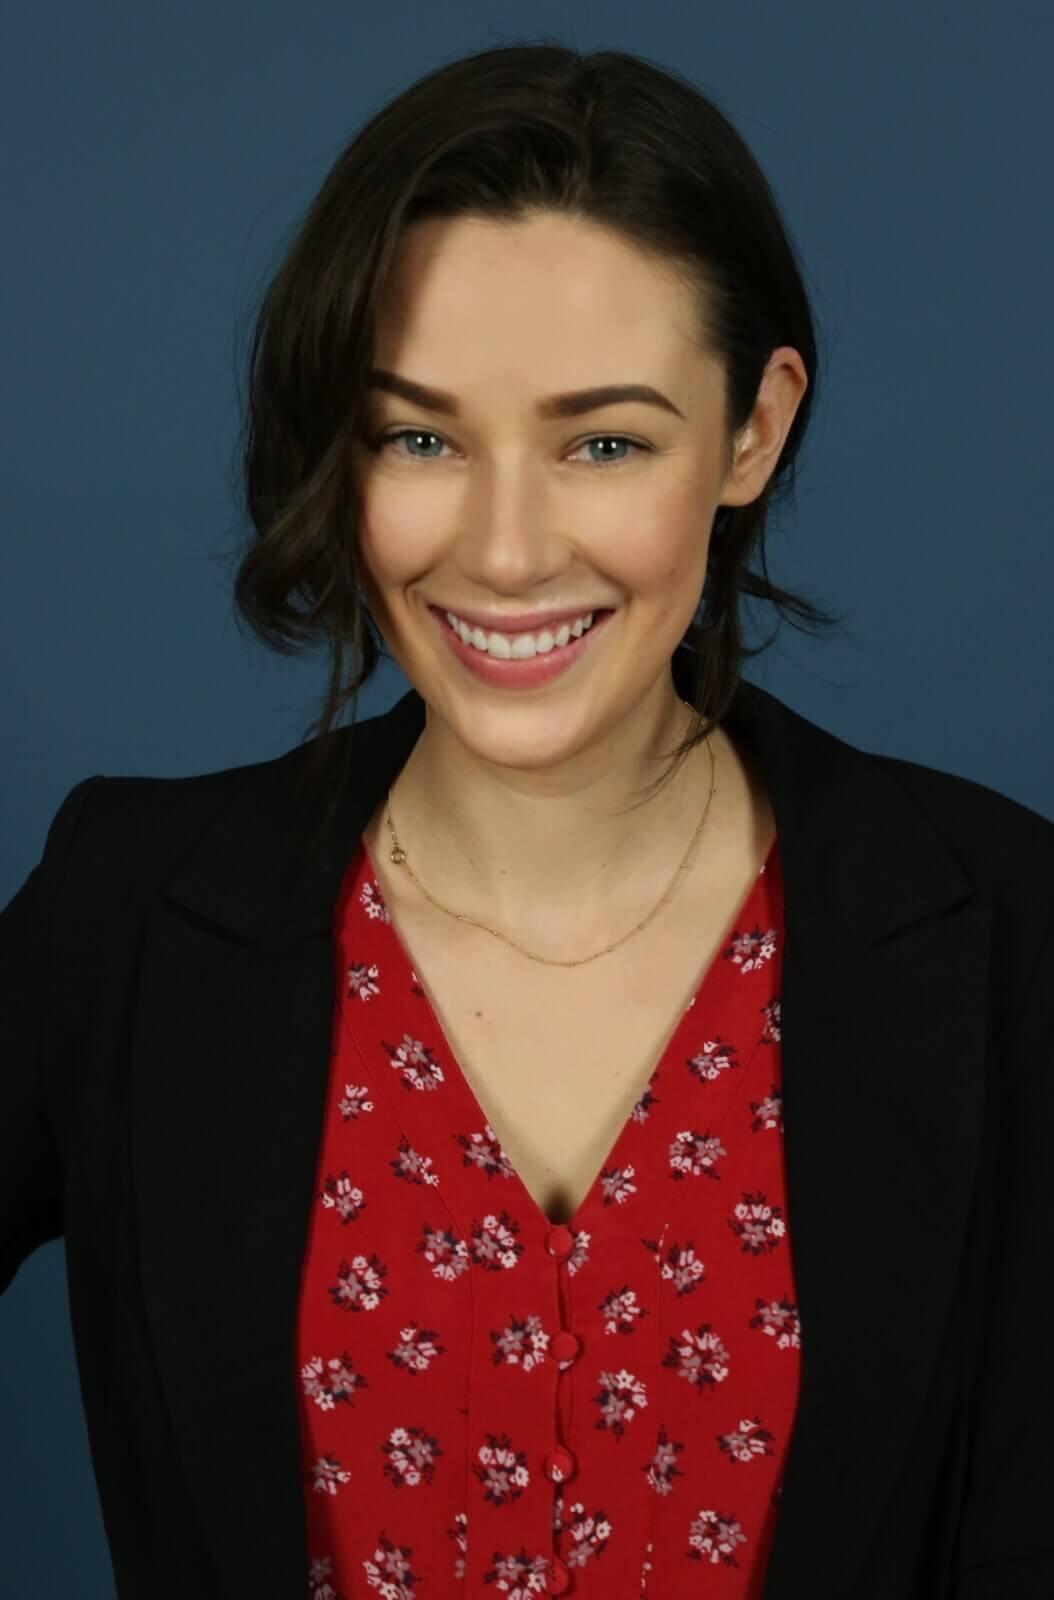 Jena Lynch